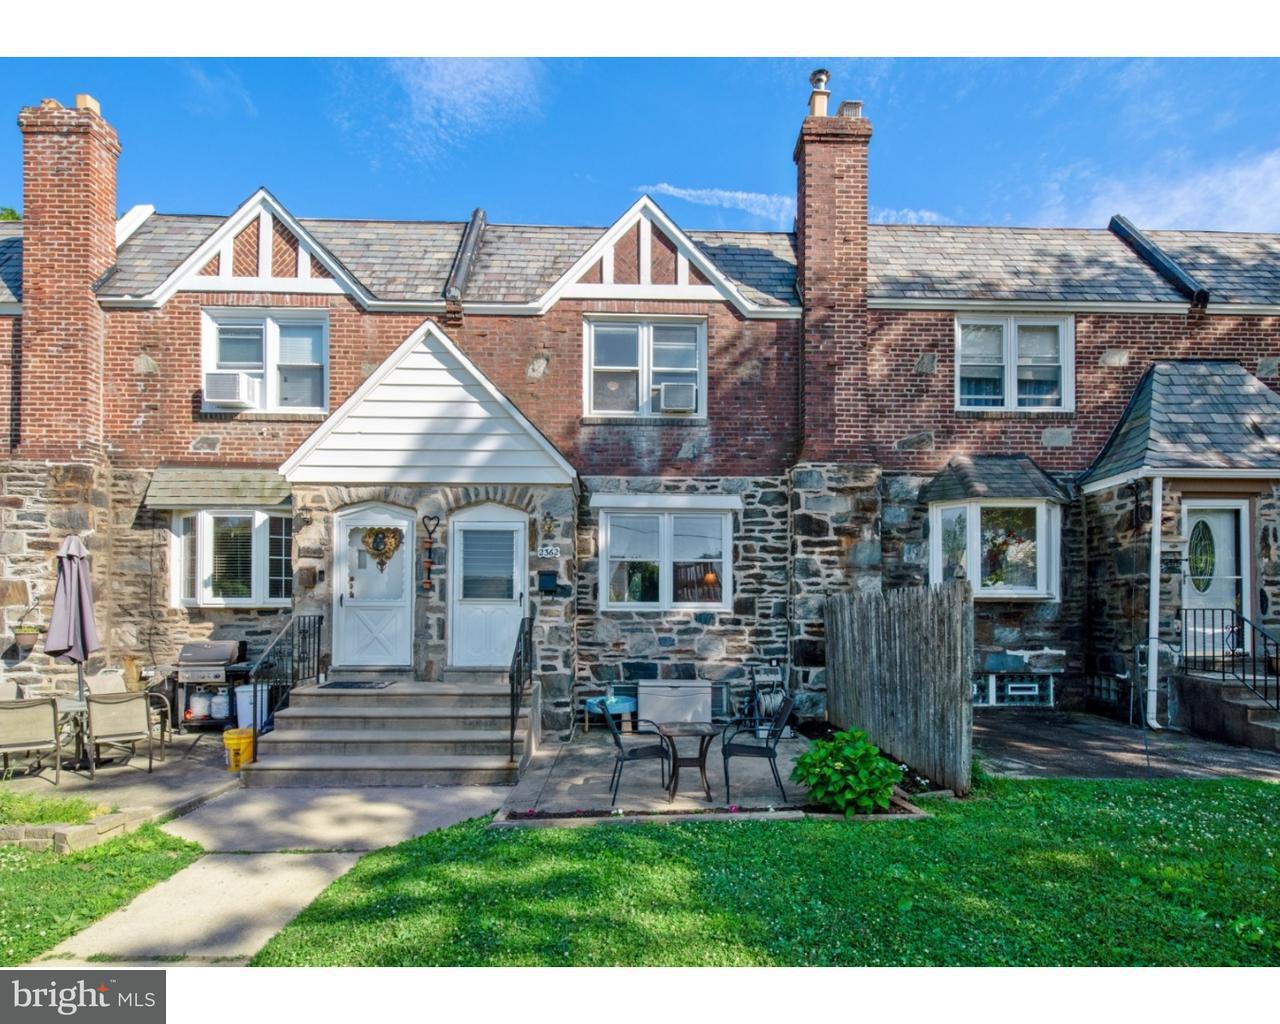 2362 Highland Avenue Drexel Hill, PA 19026